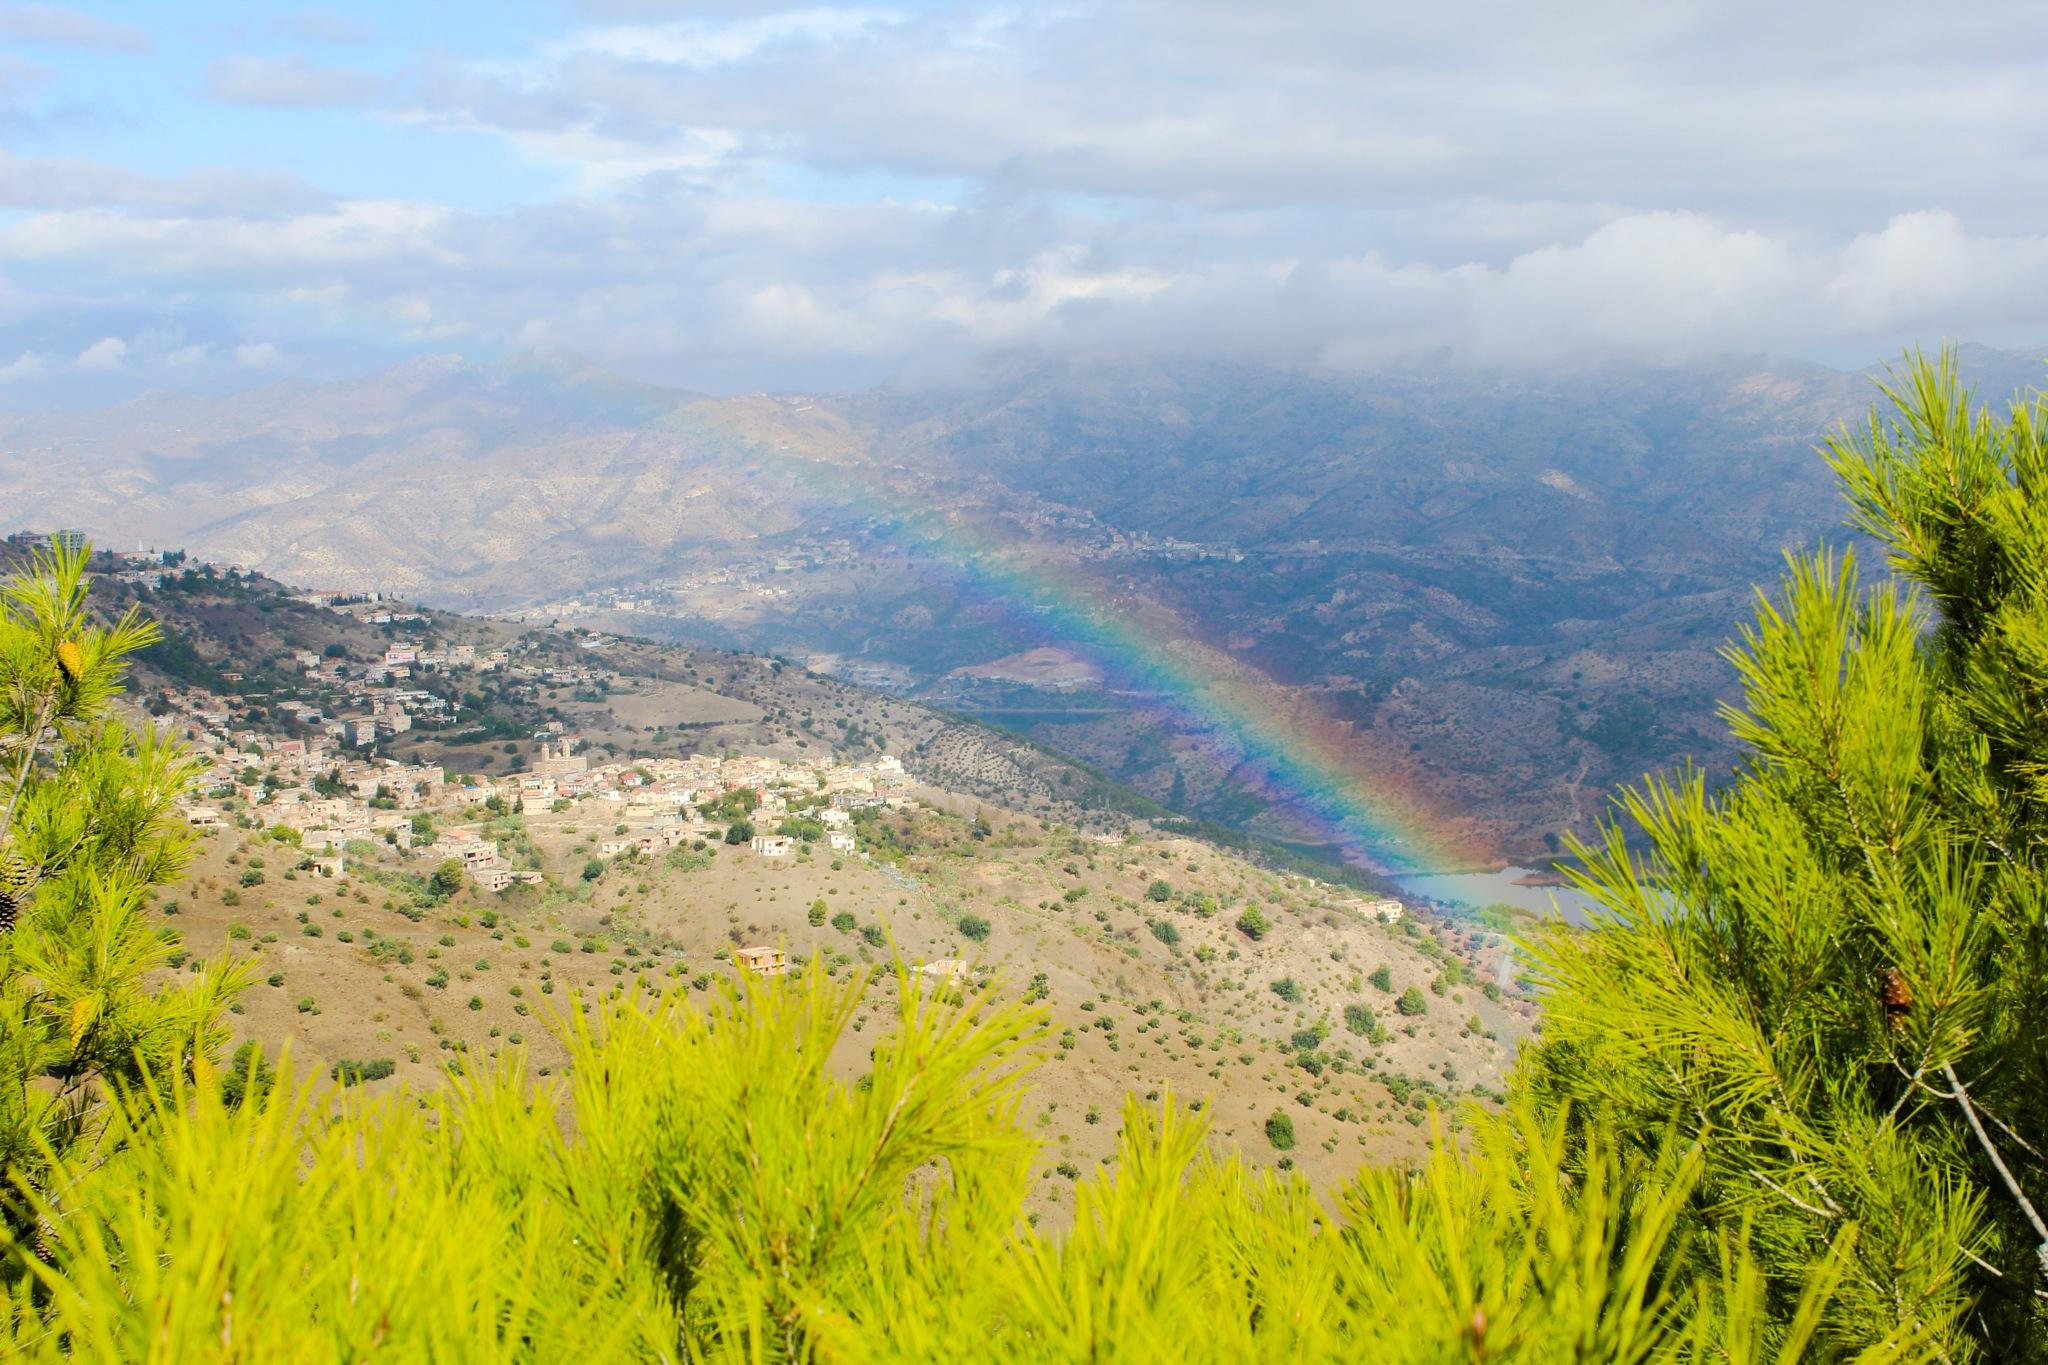 Rainbow by Tayeb photo